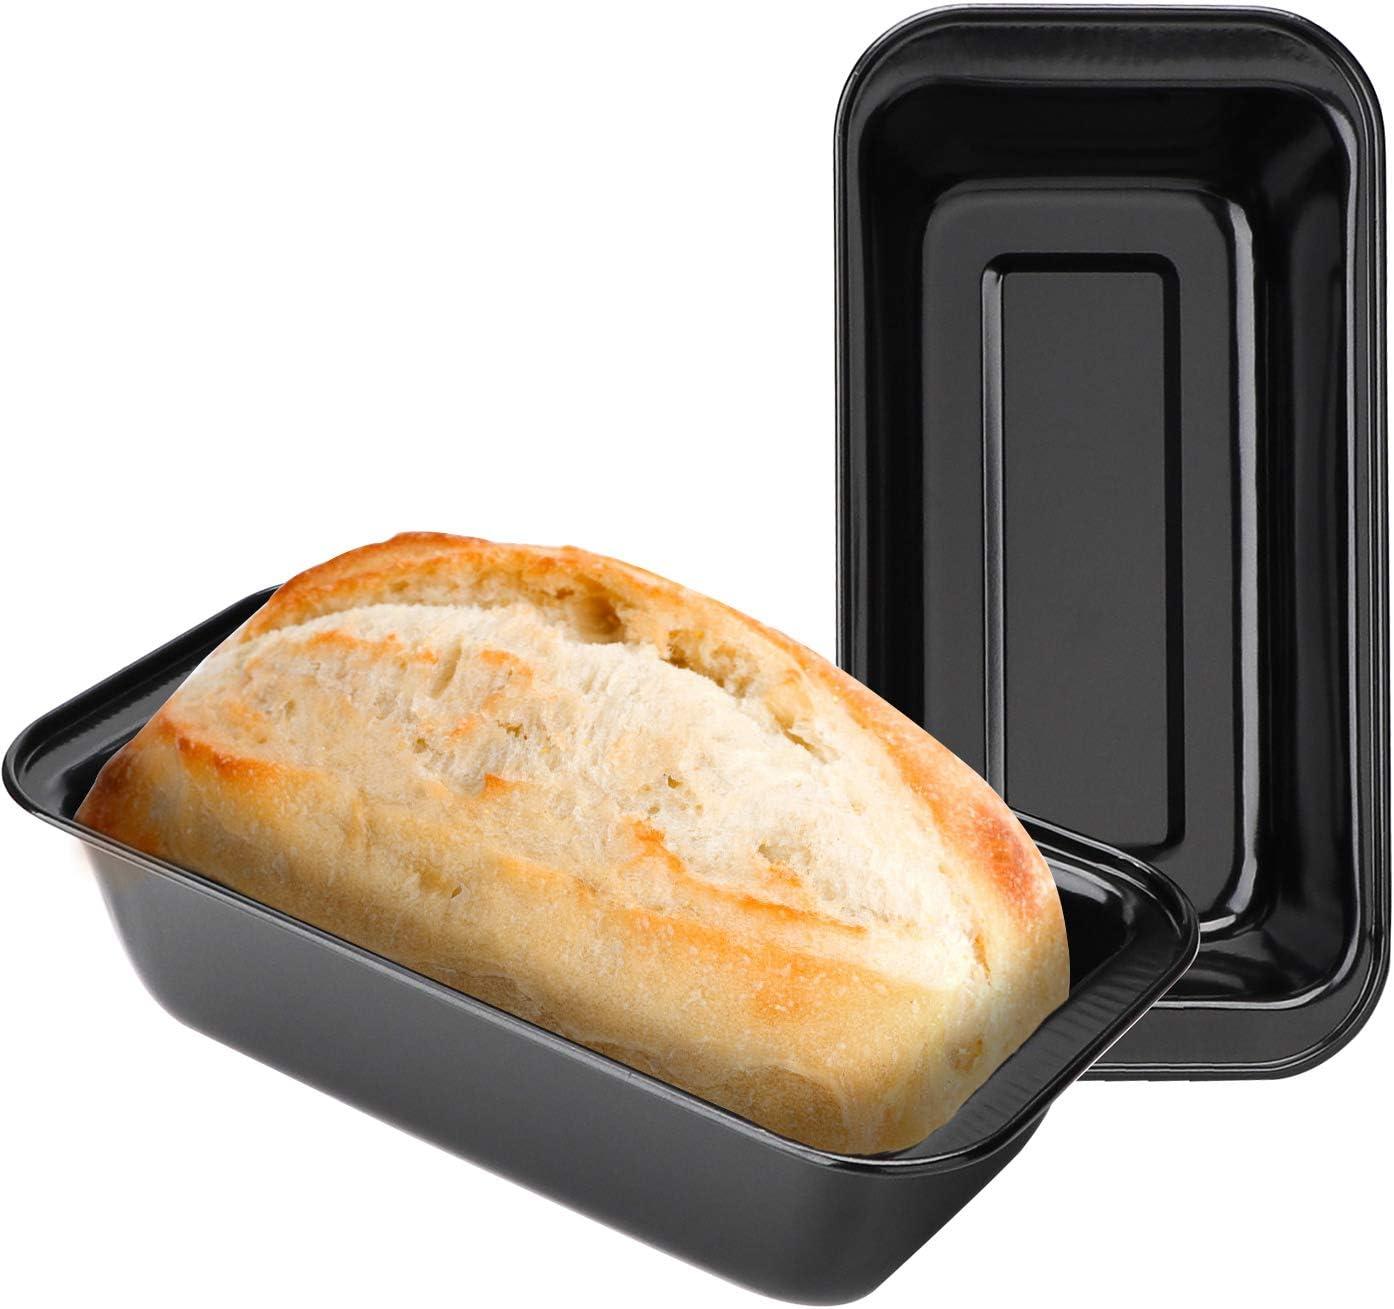 Medium Loaf Pan 8 1//2 x 4 1//2 Set of 3 Nonstick Carbon Steel Baking Bread Pan